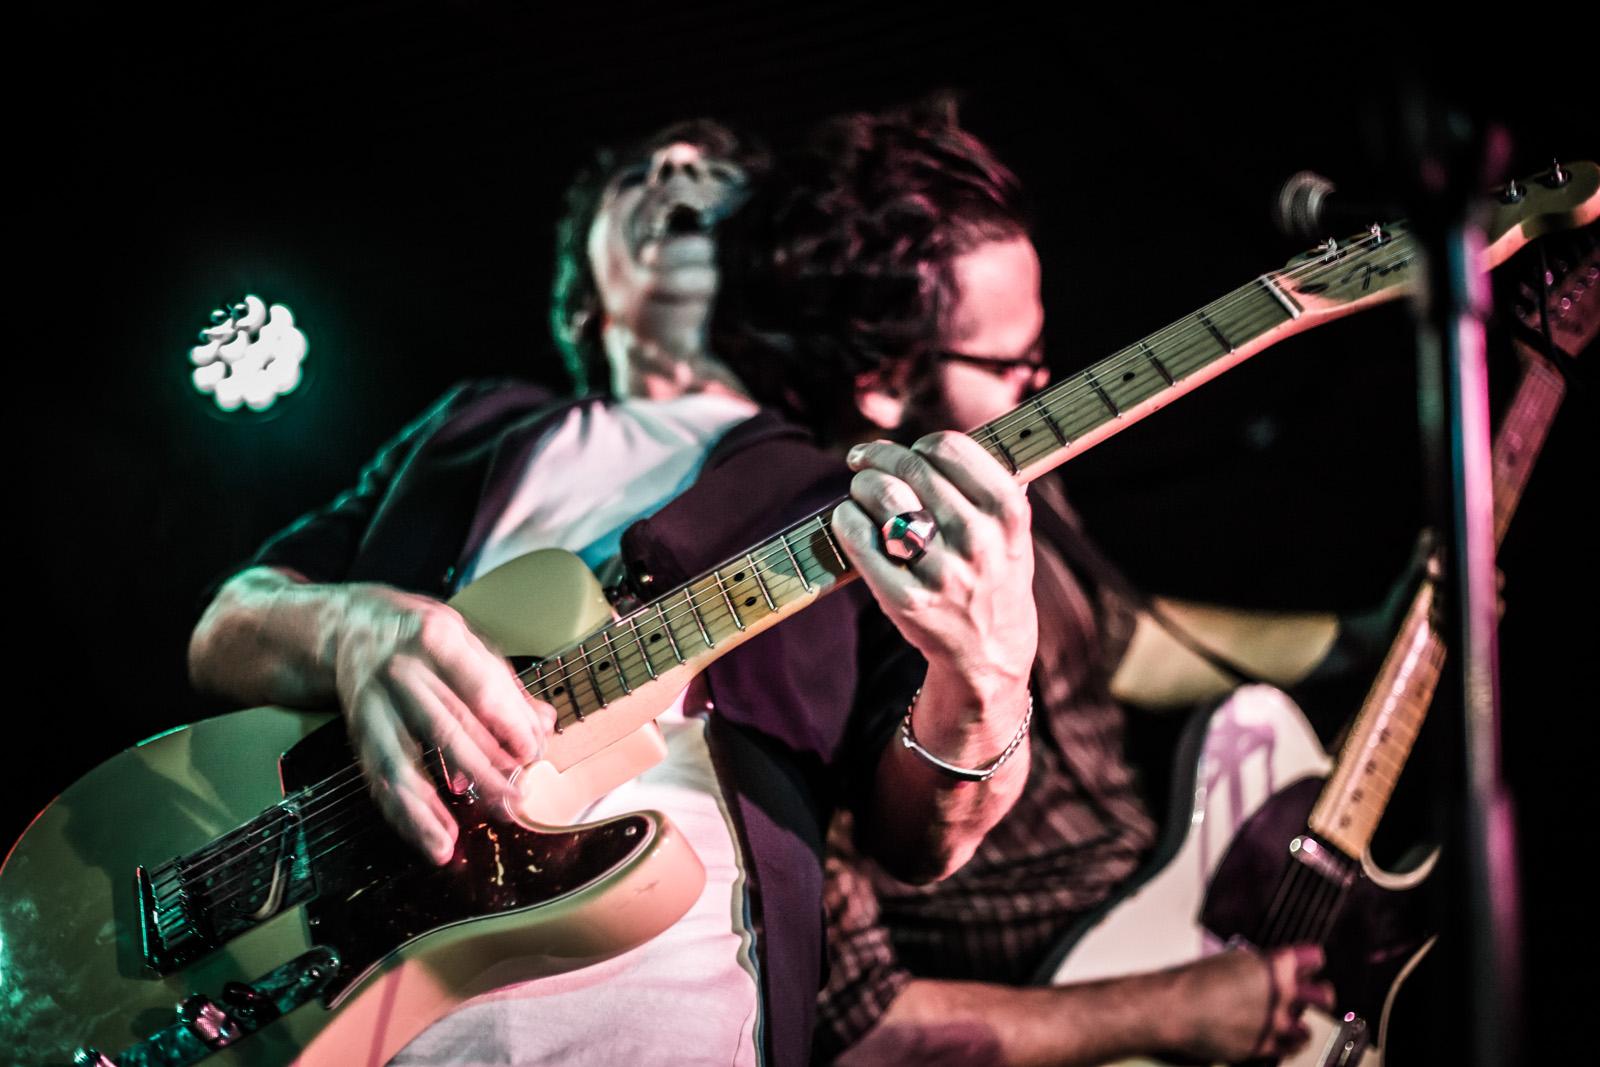 concert-sidonie-viva-quim-sala-sidecar-barcelona-qualsevol-nit